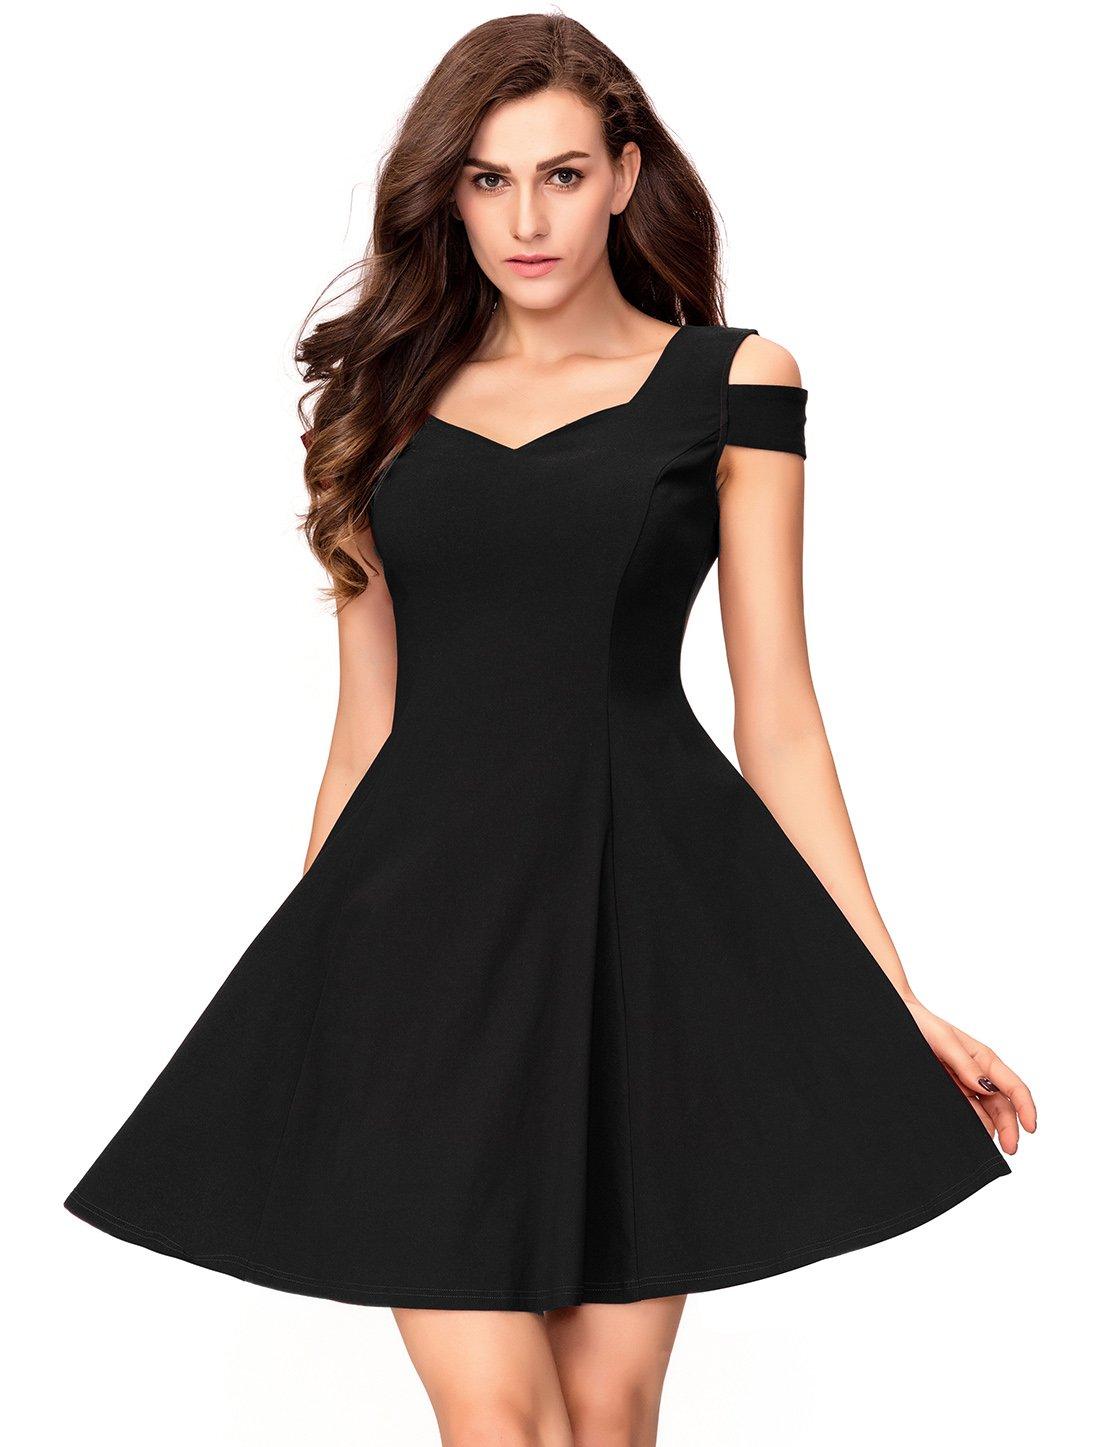 InsNova Women's Off Shoulder Little Cocktail Party A-line Skater Dress (X-Small, Black)